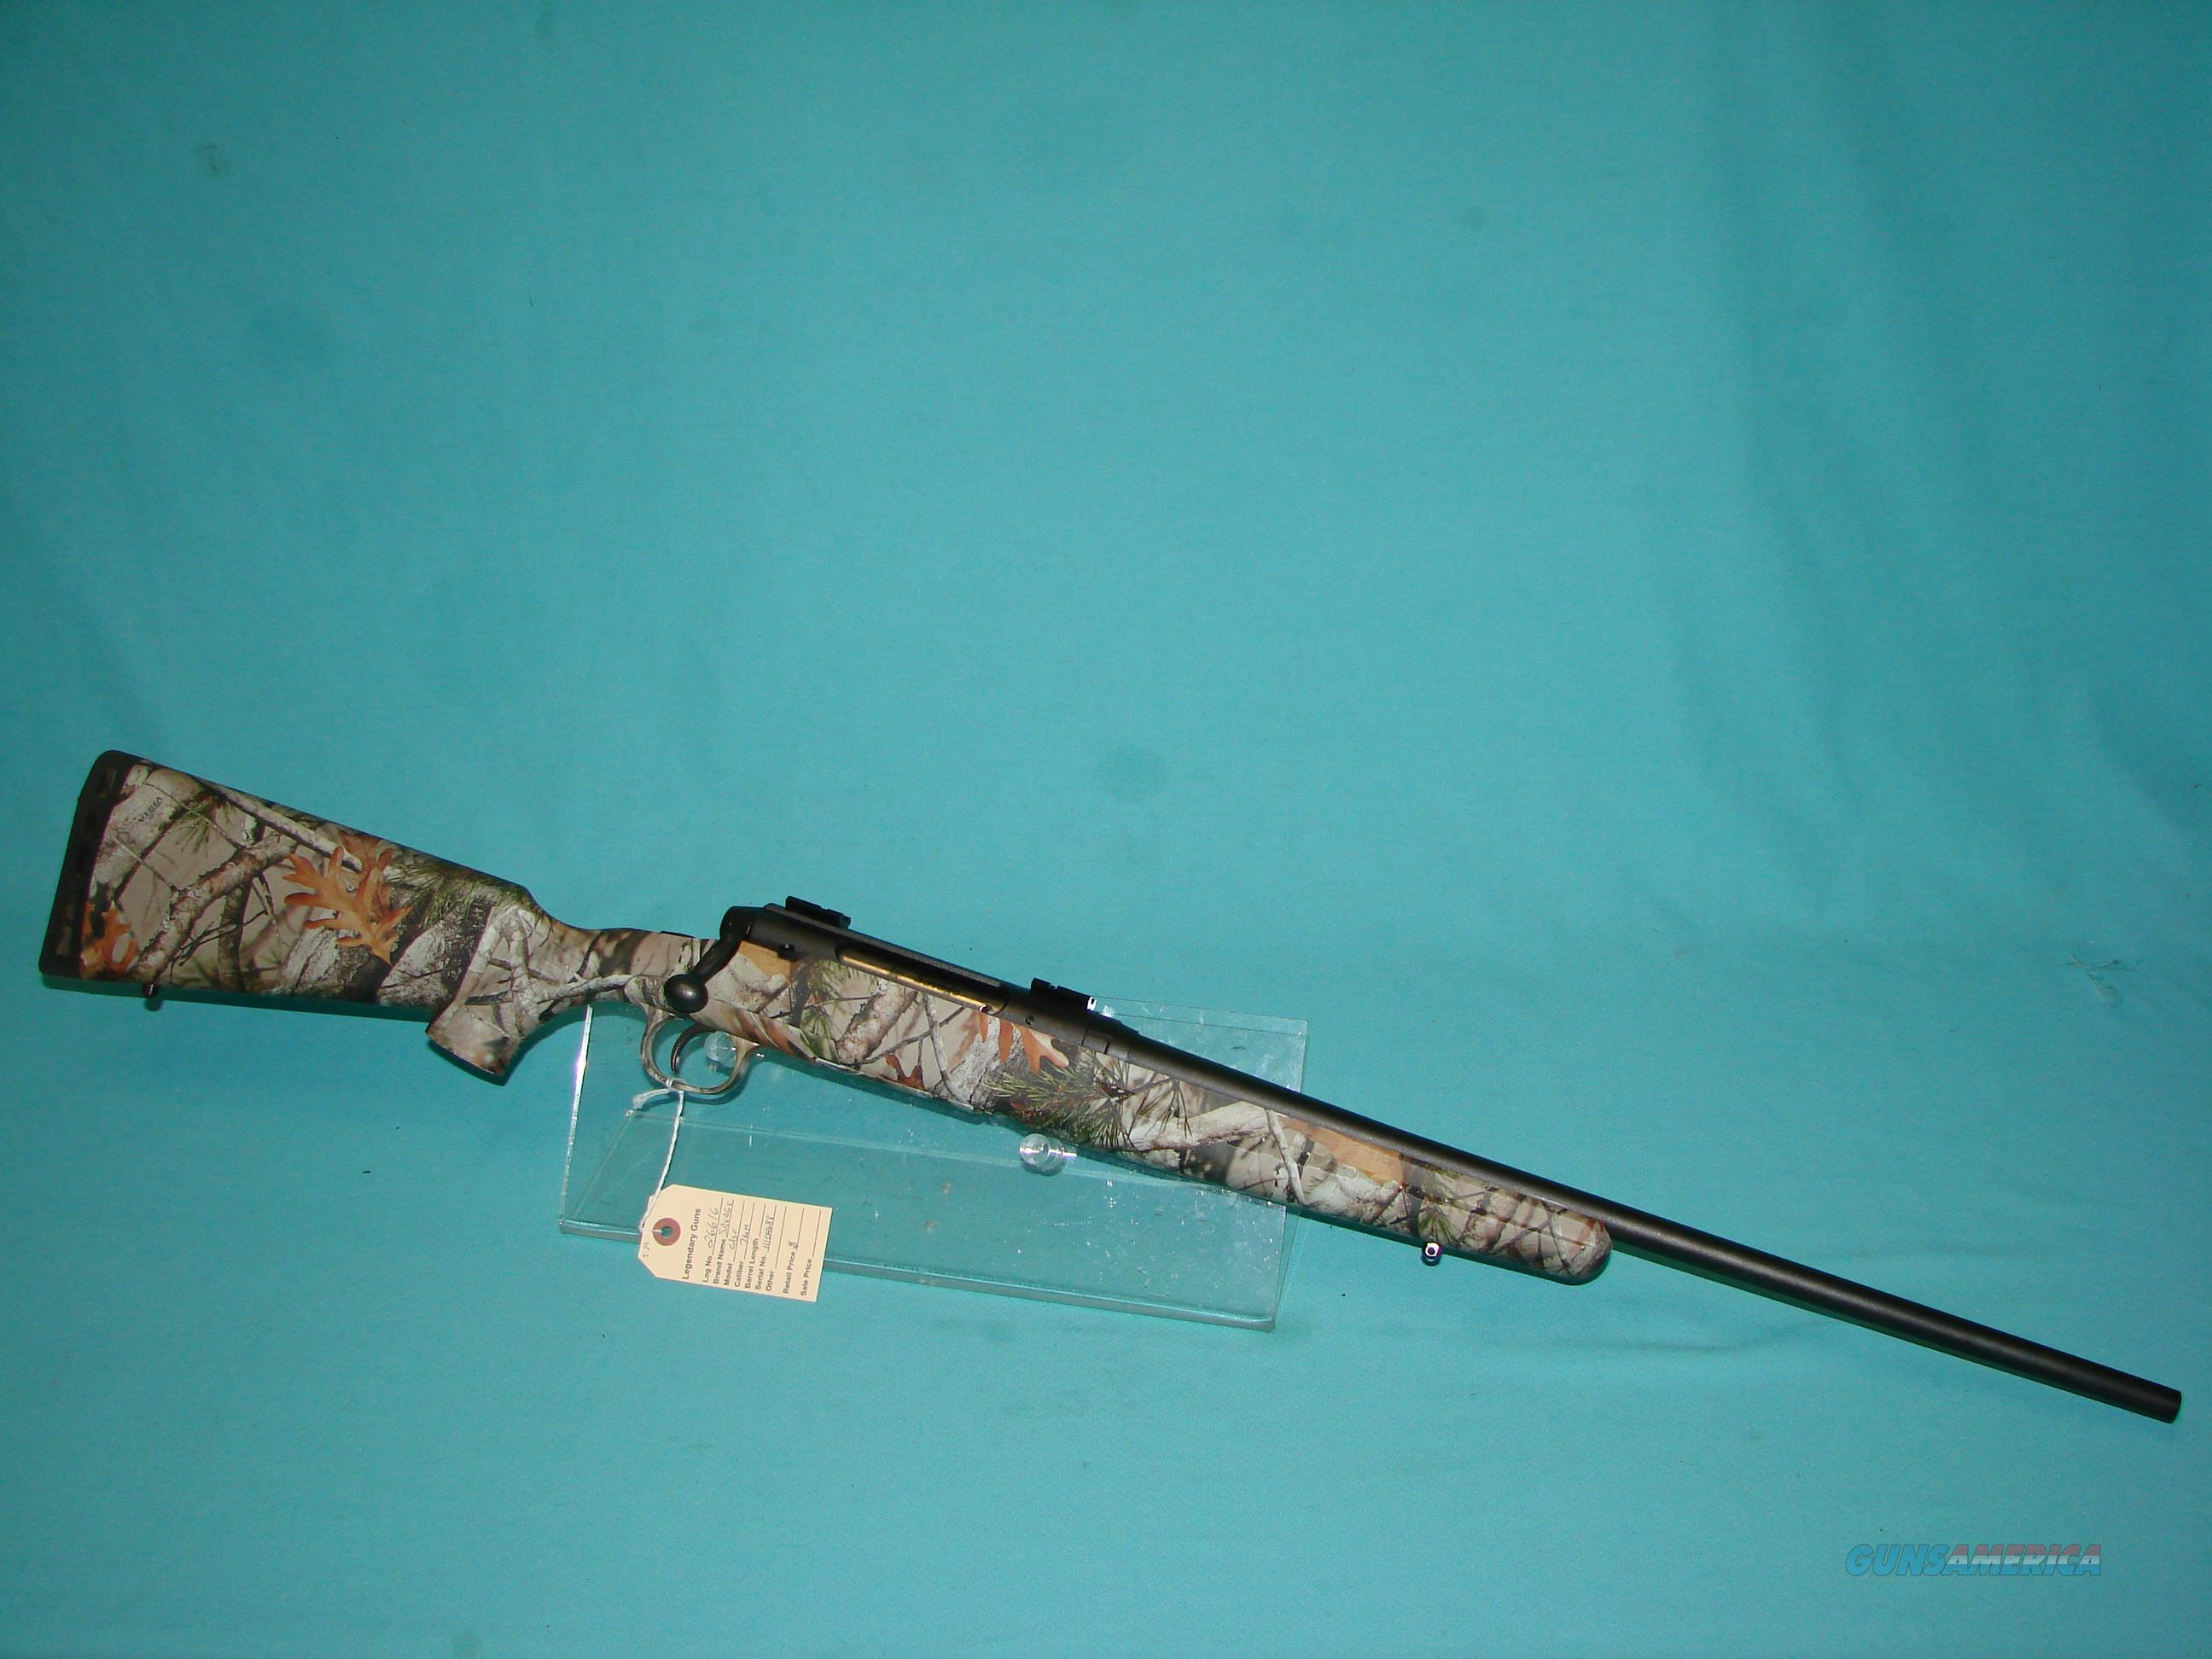 Savage Edge 7mm-08  Guns > Rifles > Savage Rifles > Standard Bolt Action > Sporting